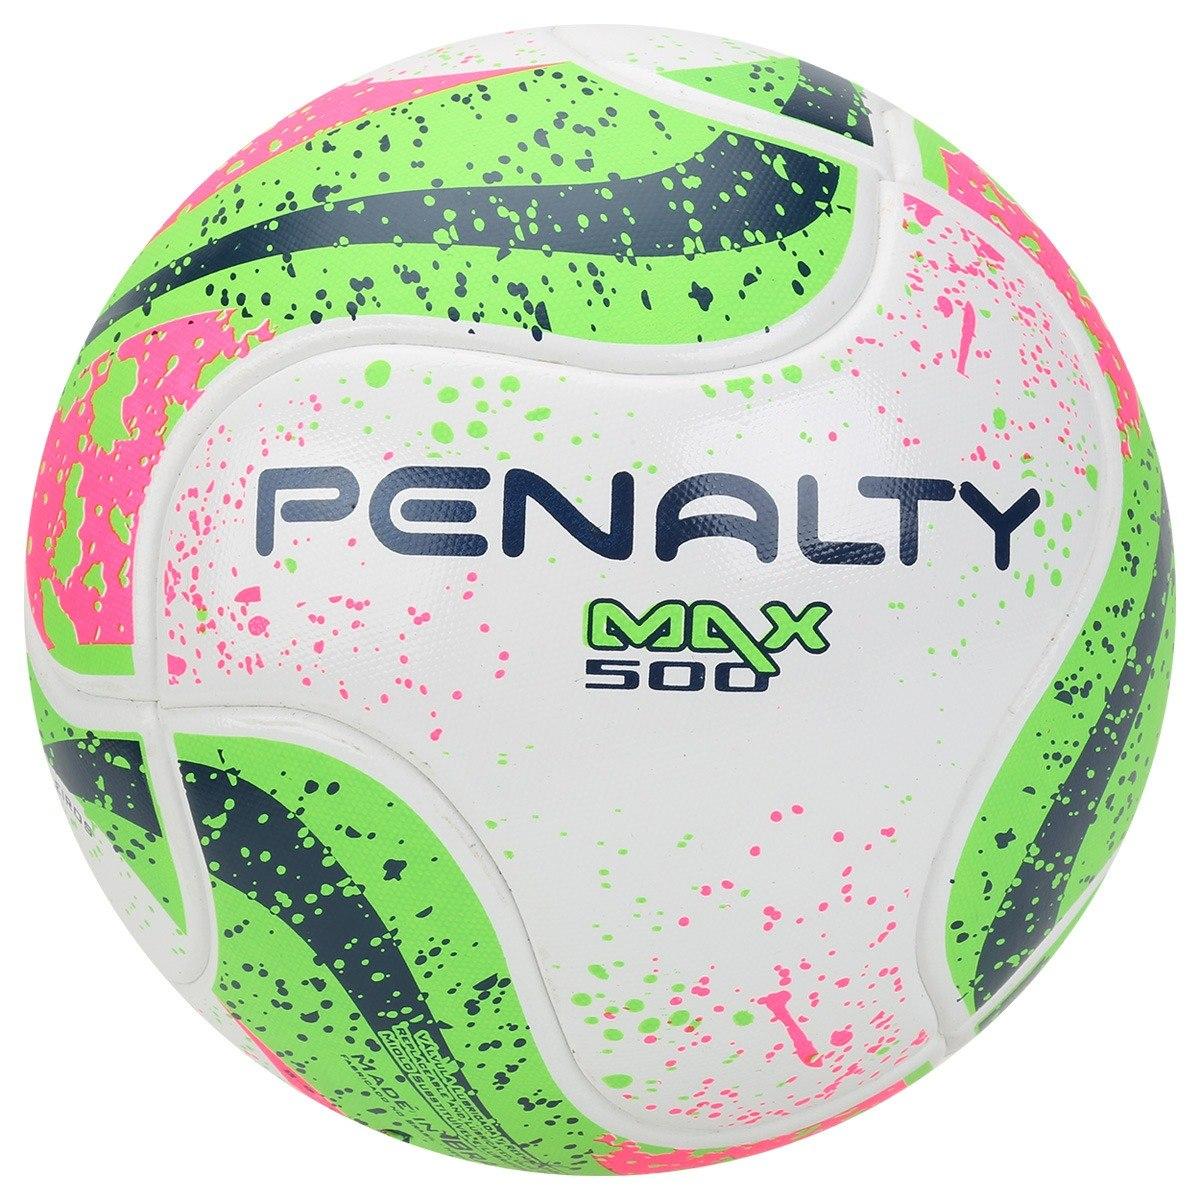 4d21e16a75649 bola futsal penalty max 500 termotec 7 sem costura - 541442. Carregando  zoom.